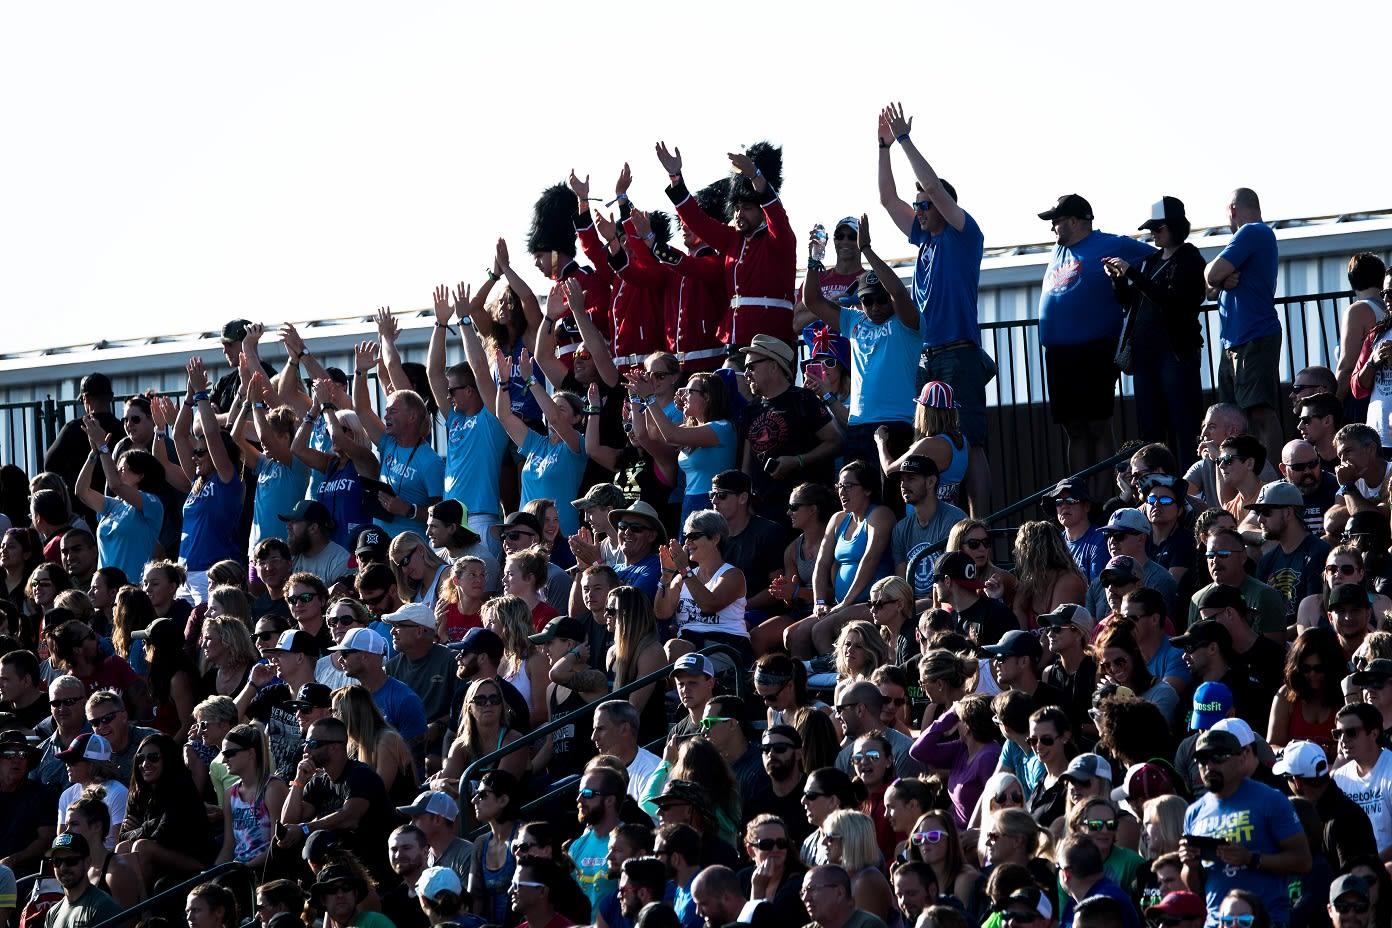 cfgames-roundup-crowd